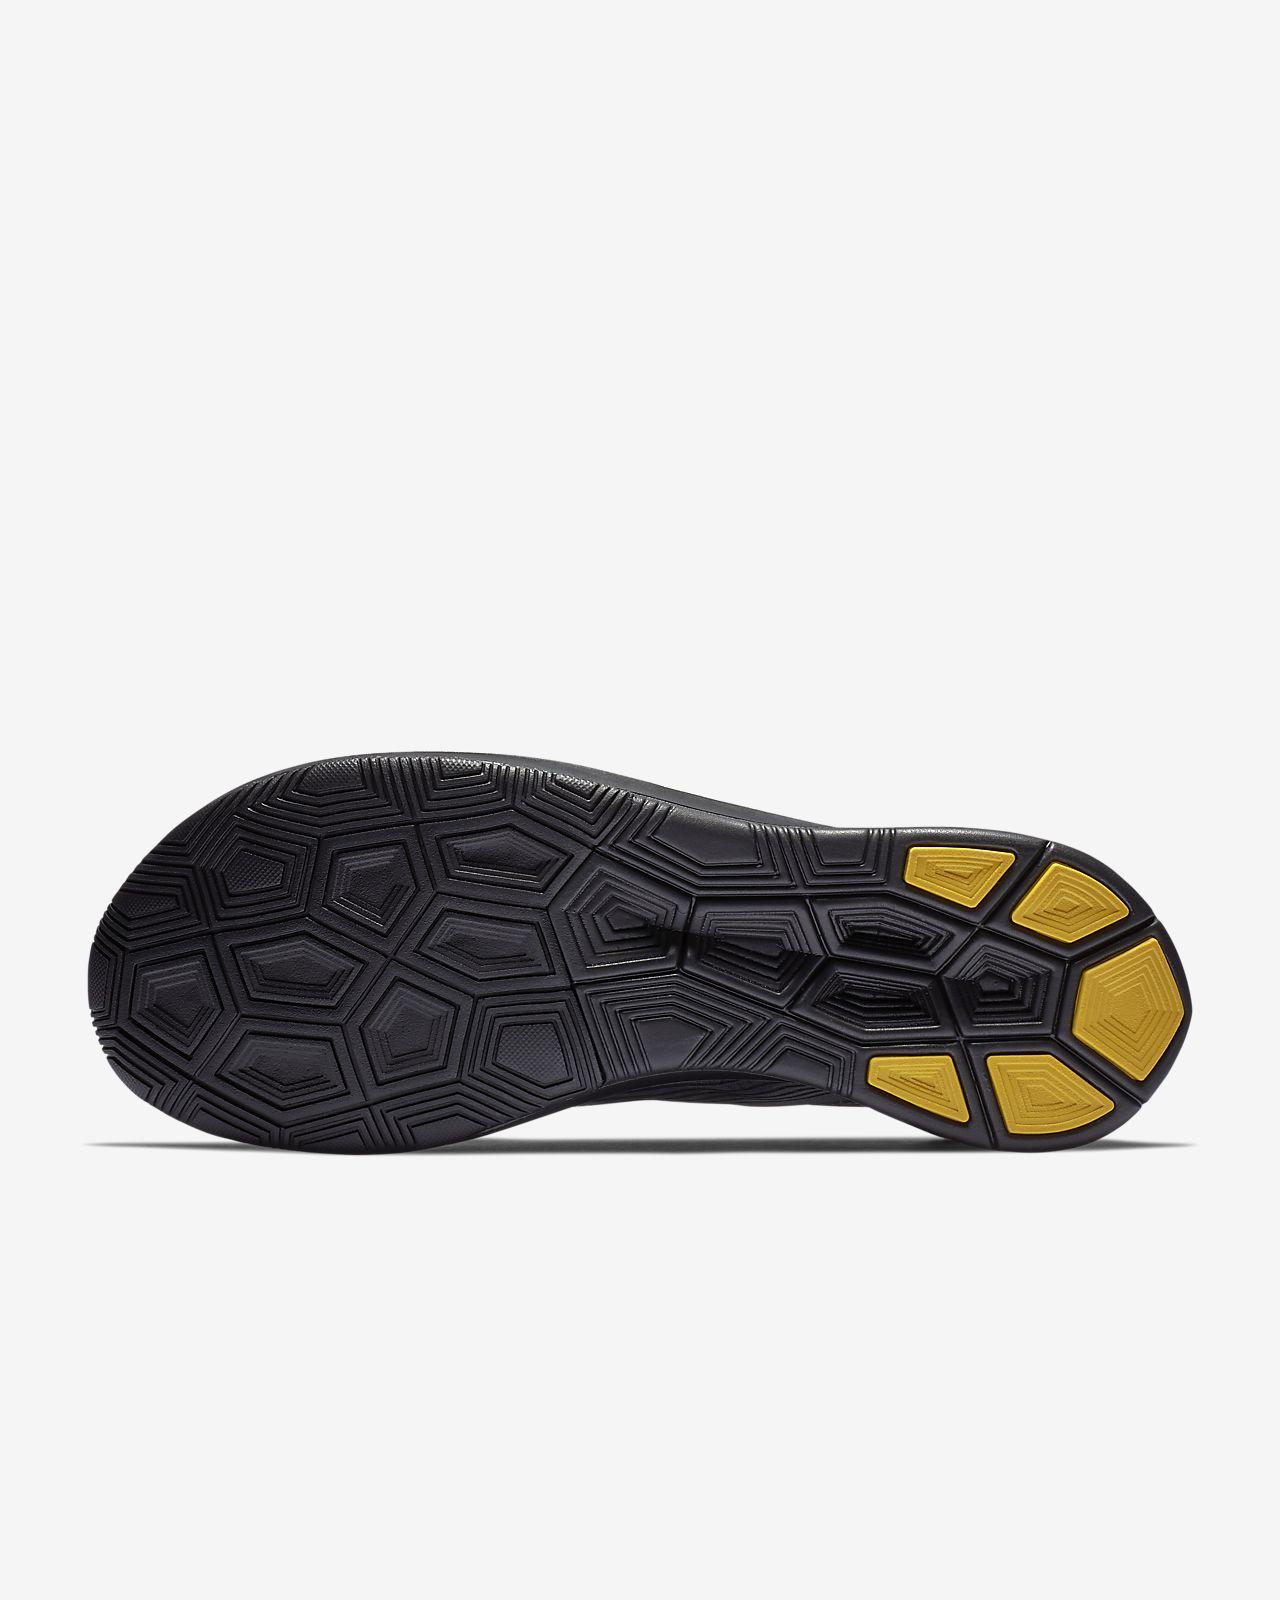 6fcc2a592c94c Nike x Gyakusou Zoom Fly Running Shoe. Nike.com IN